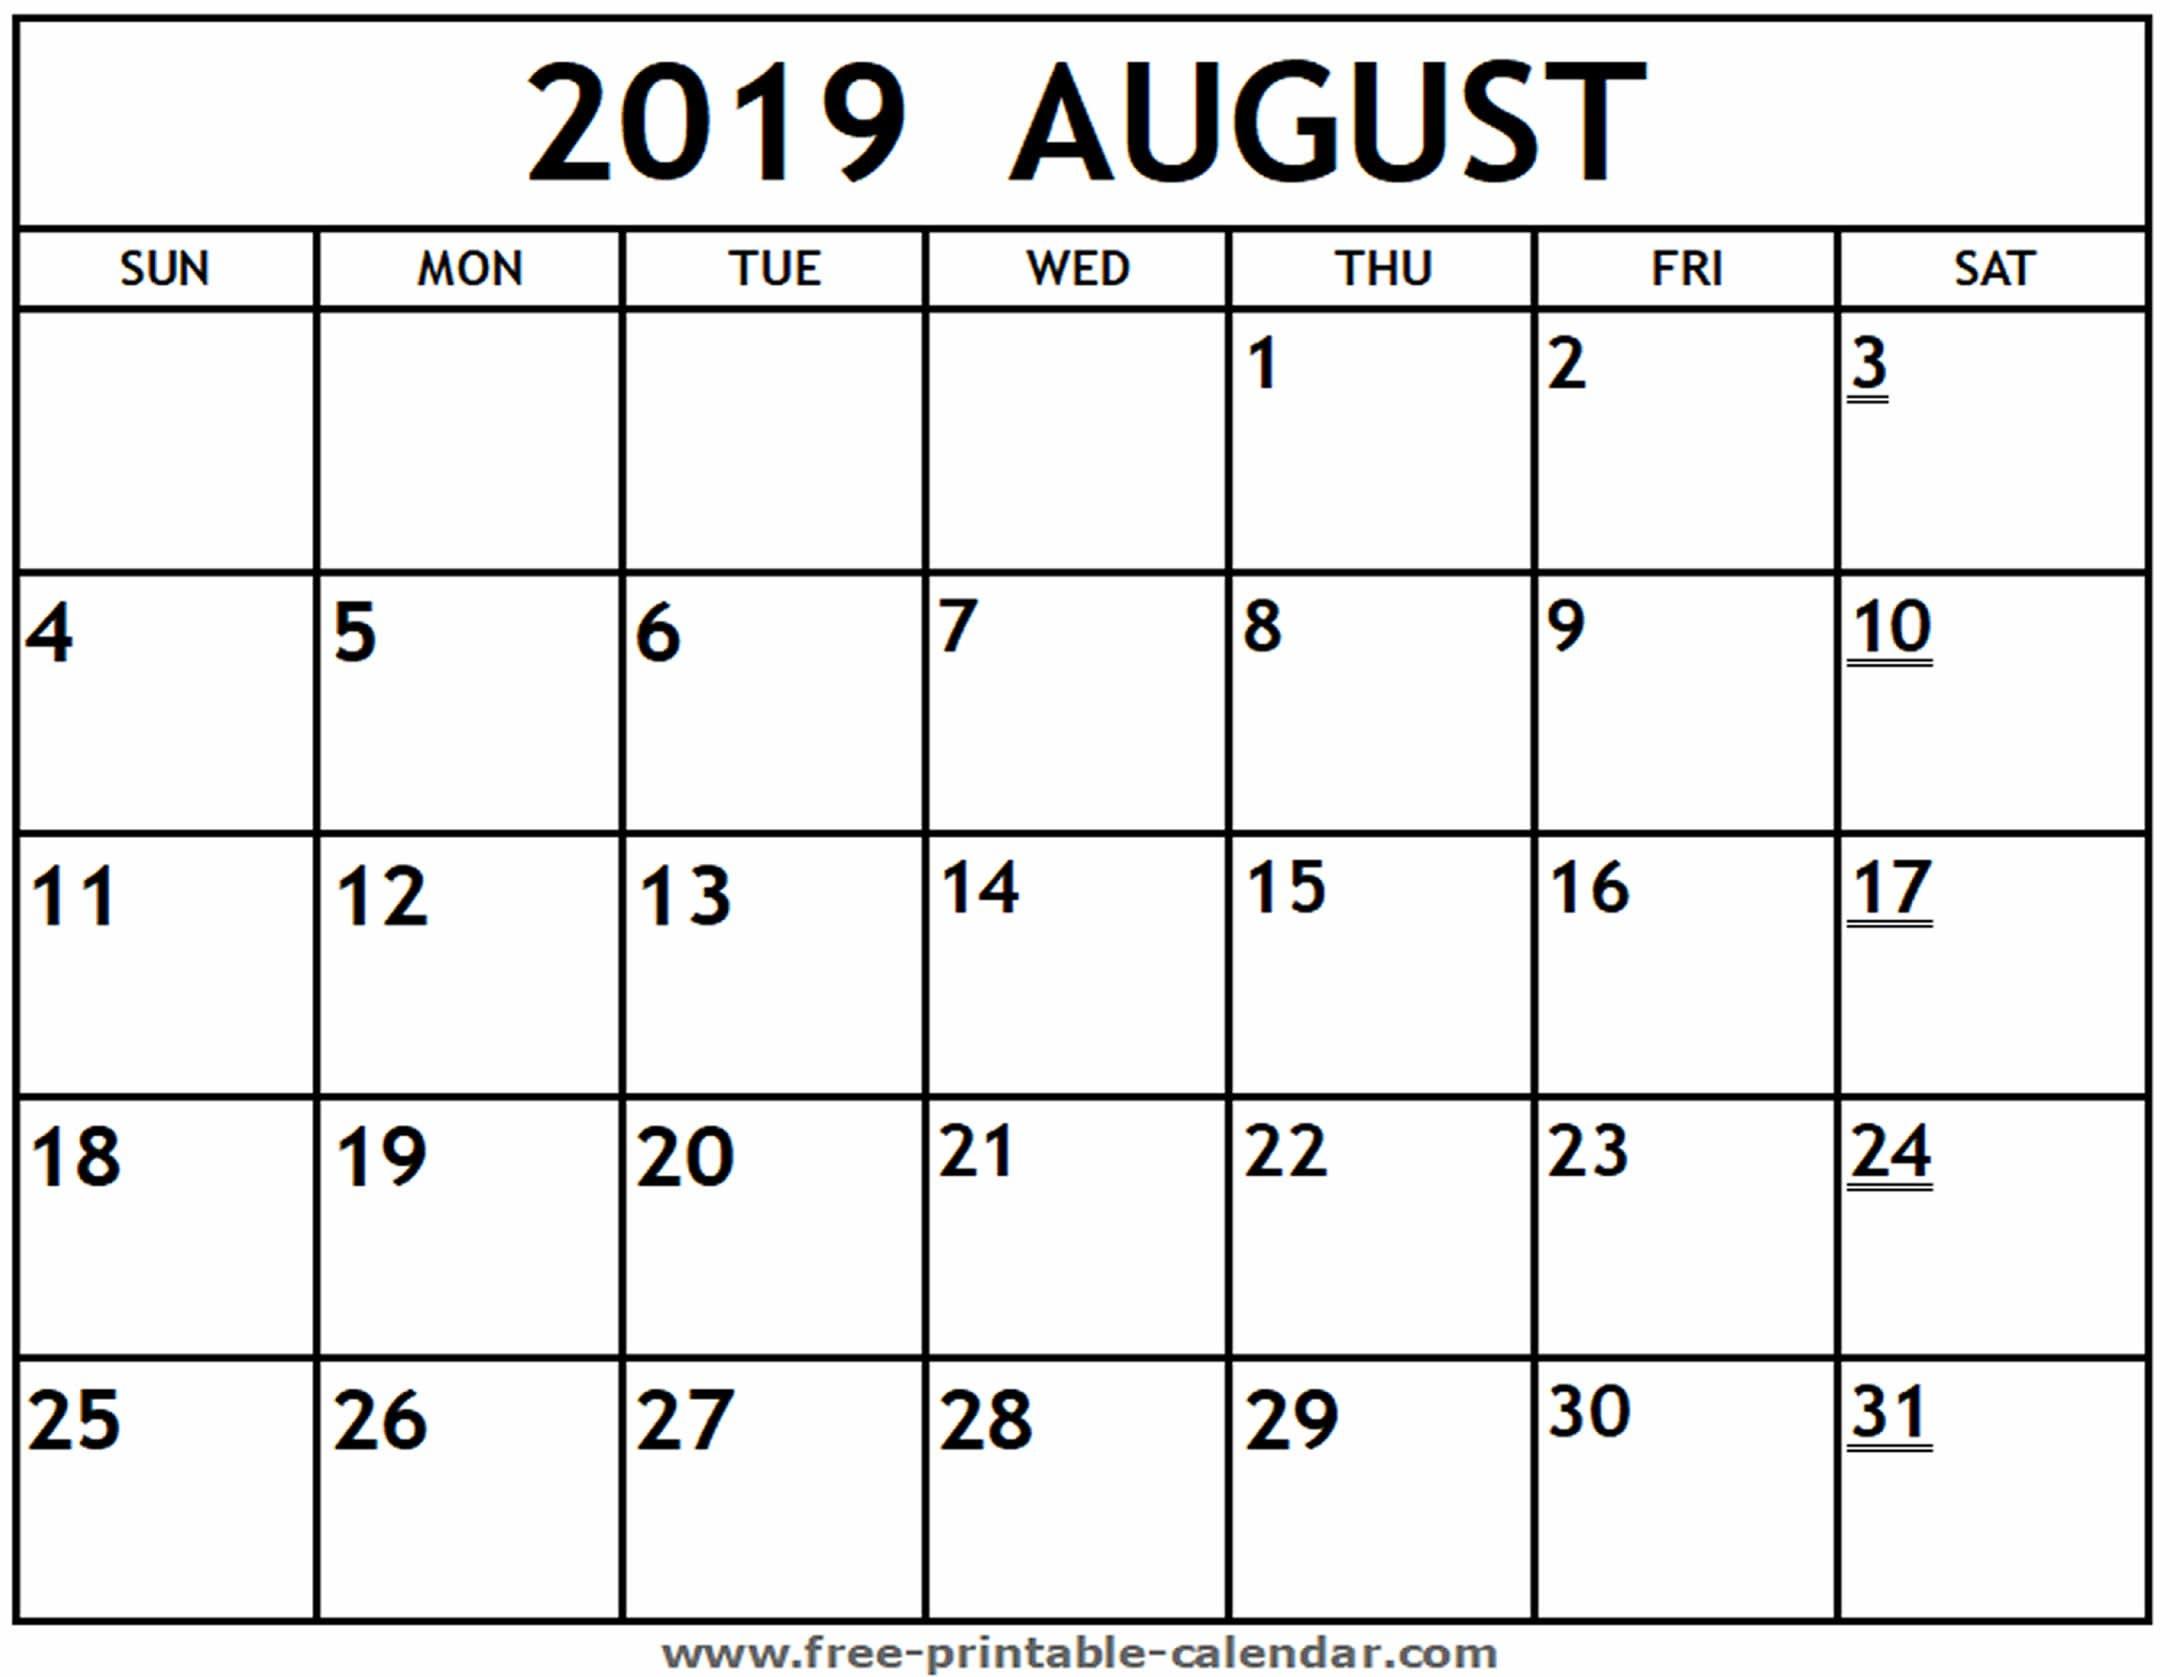 Printable 2019 August Calendar - Free-Printable-Calendar Calendar 2019 August